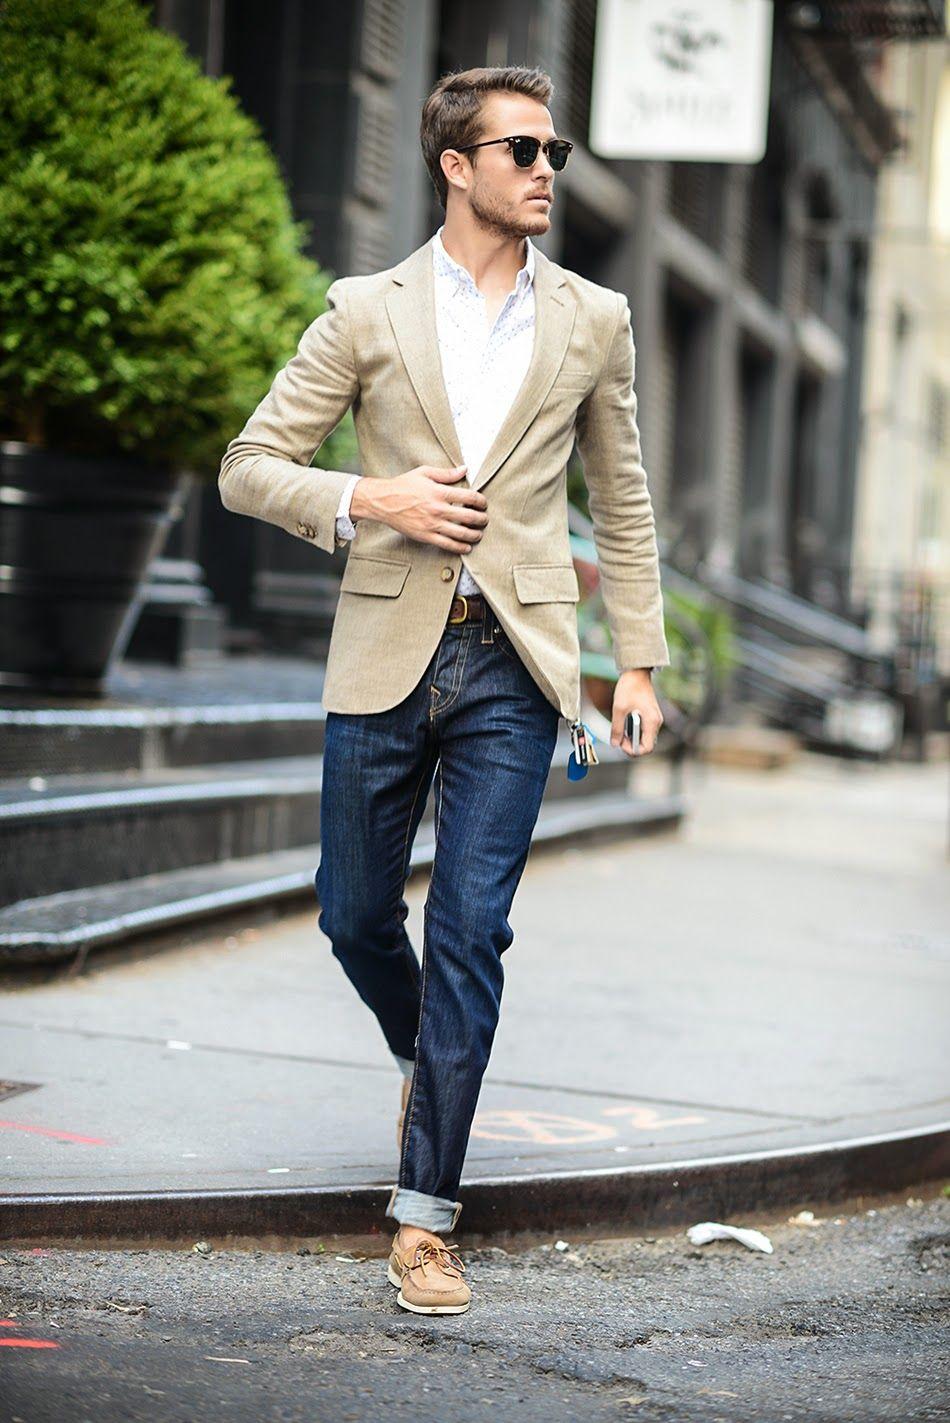 Summer Denim … | Stile für männer, Mode für männer, Männer mode